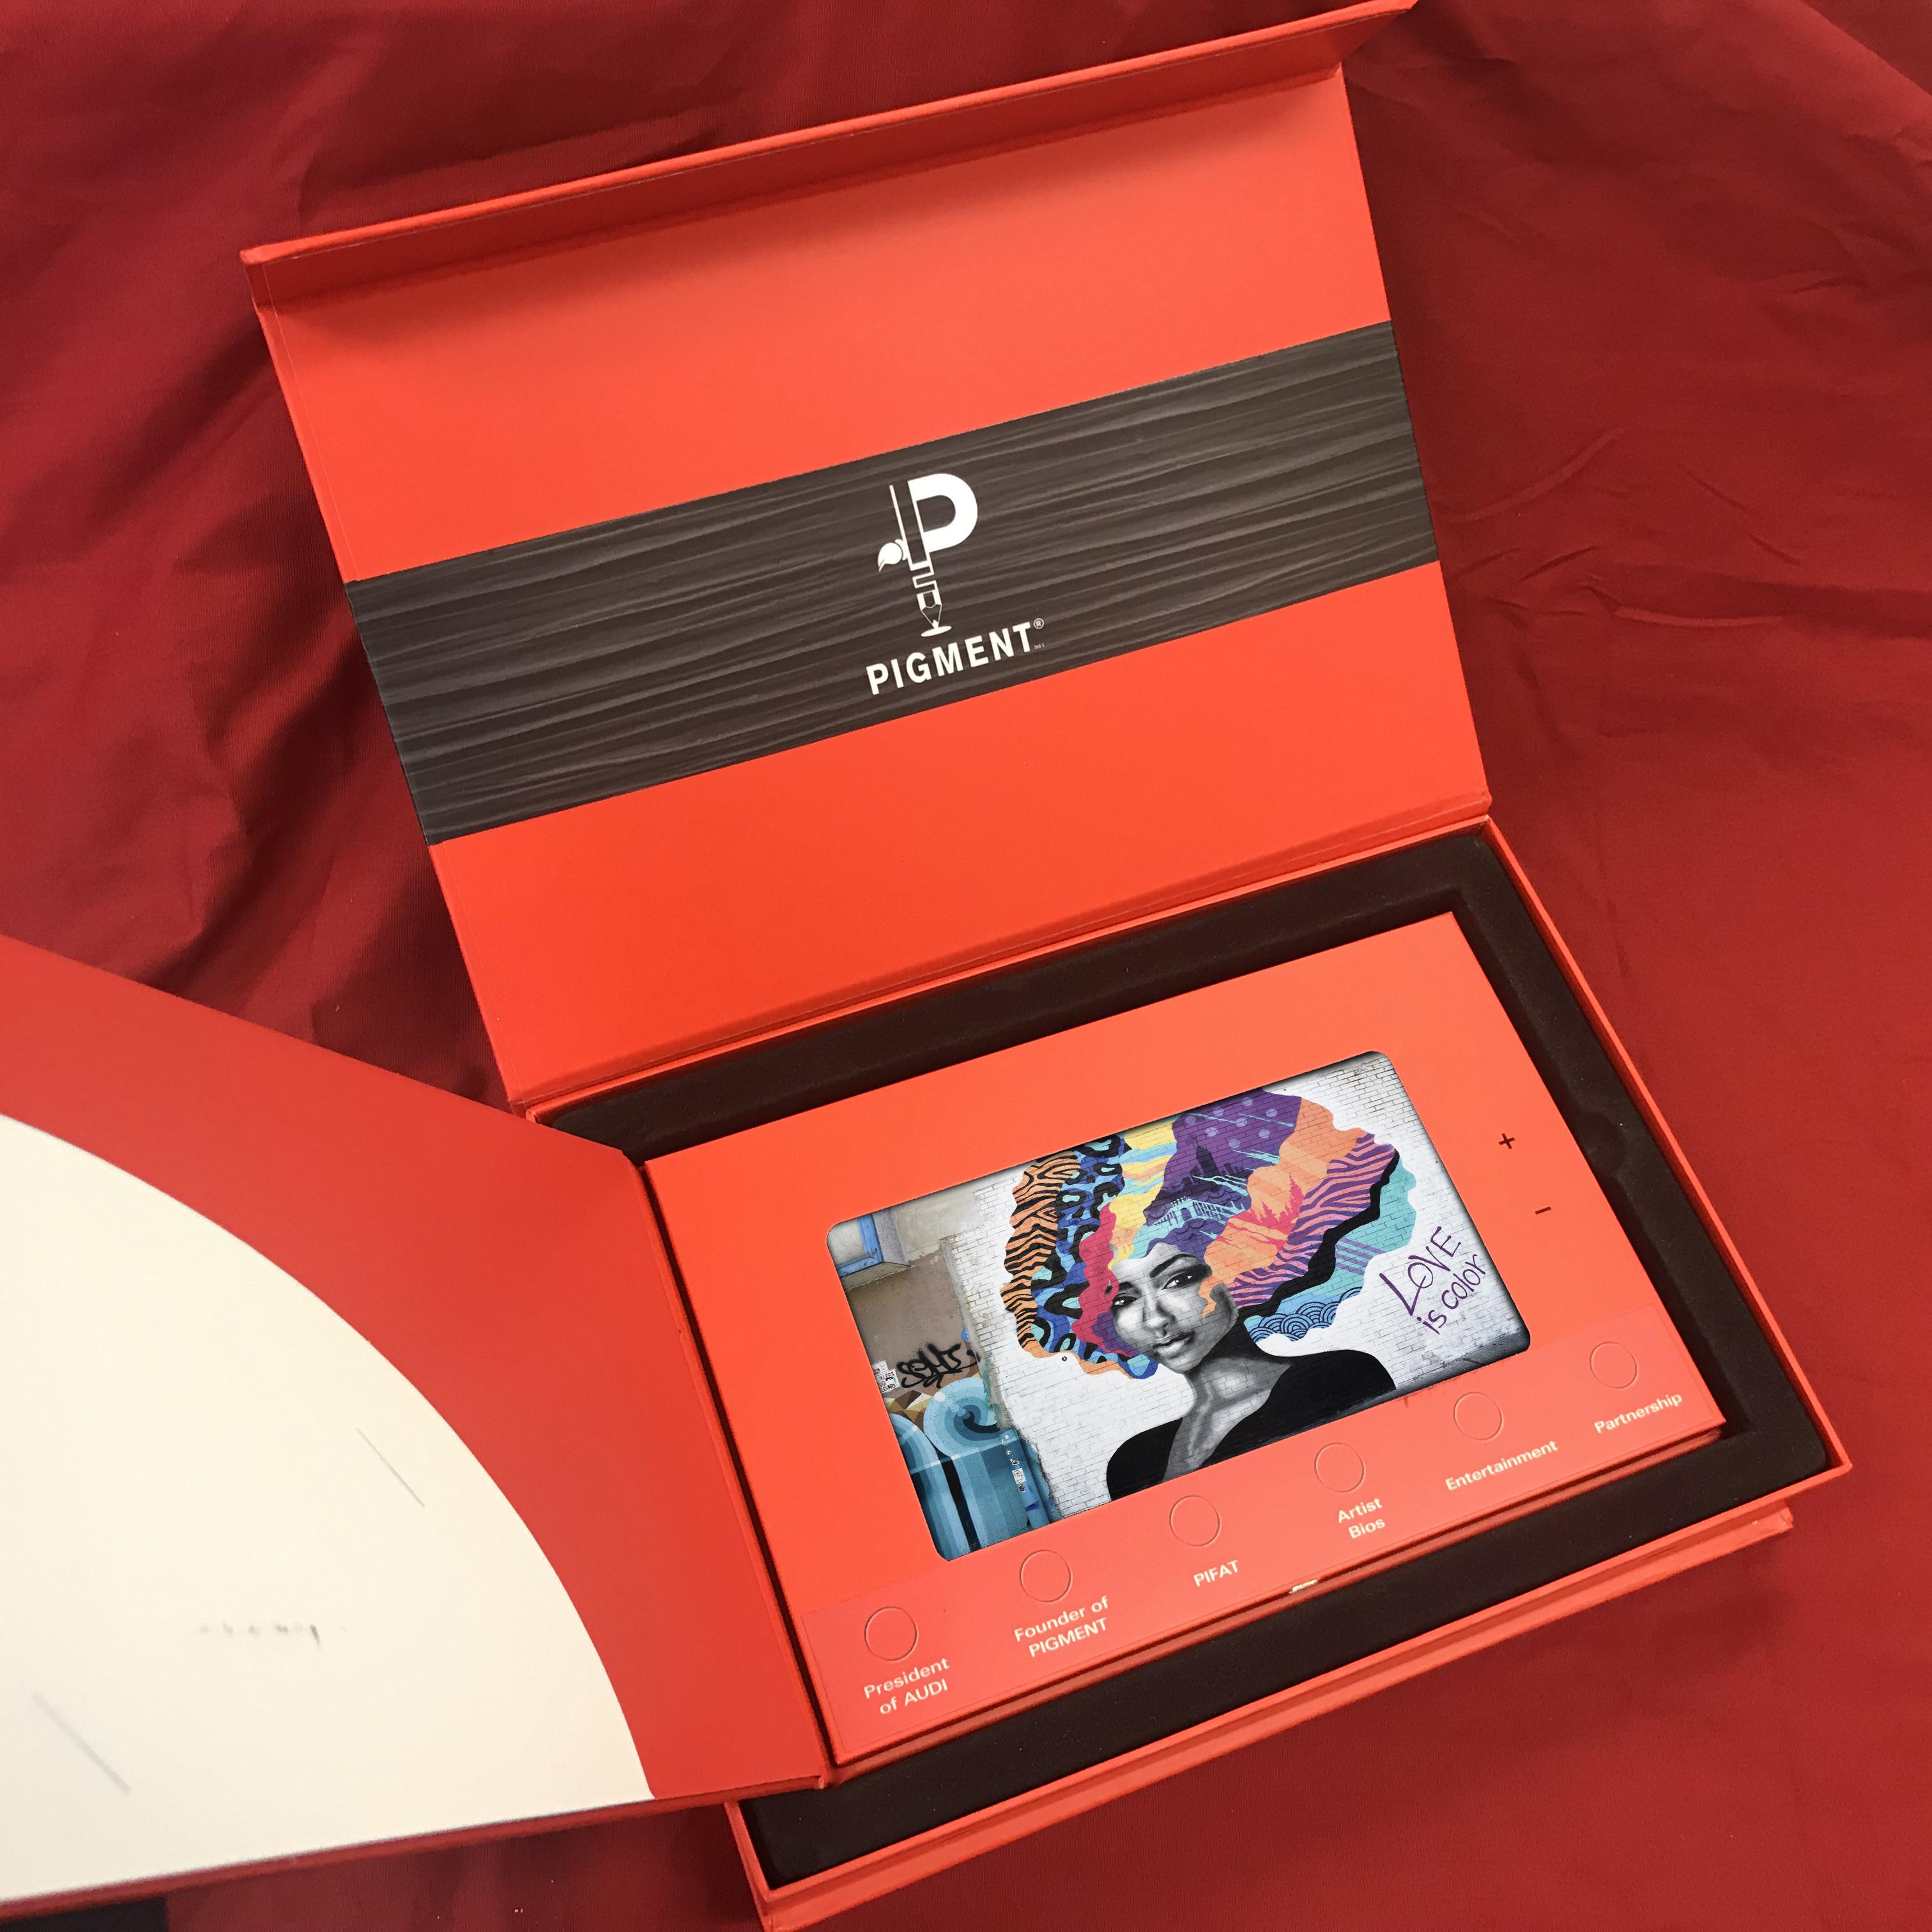 Custom video box with 7 inch LCD screen